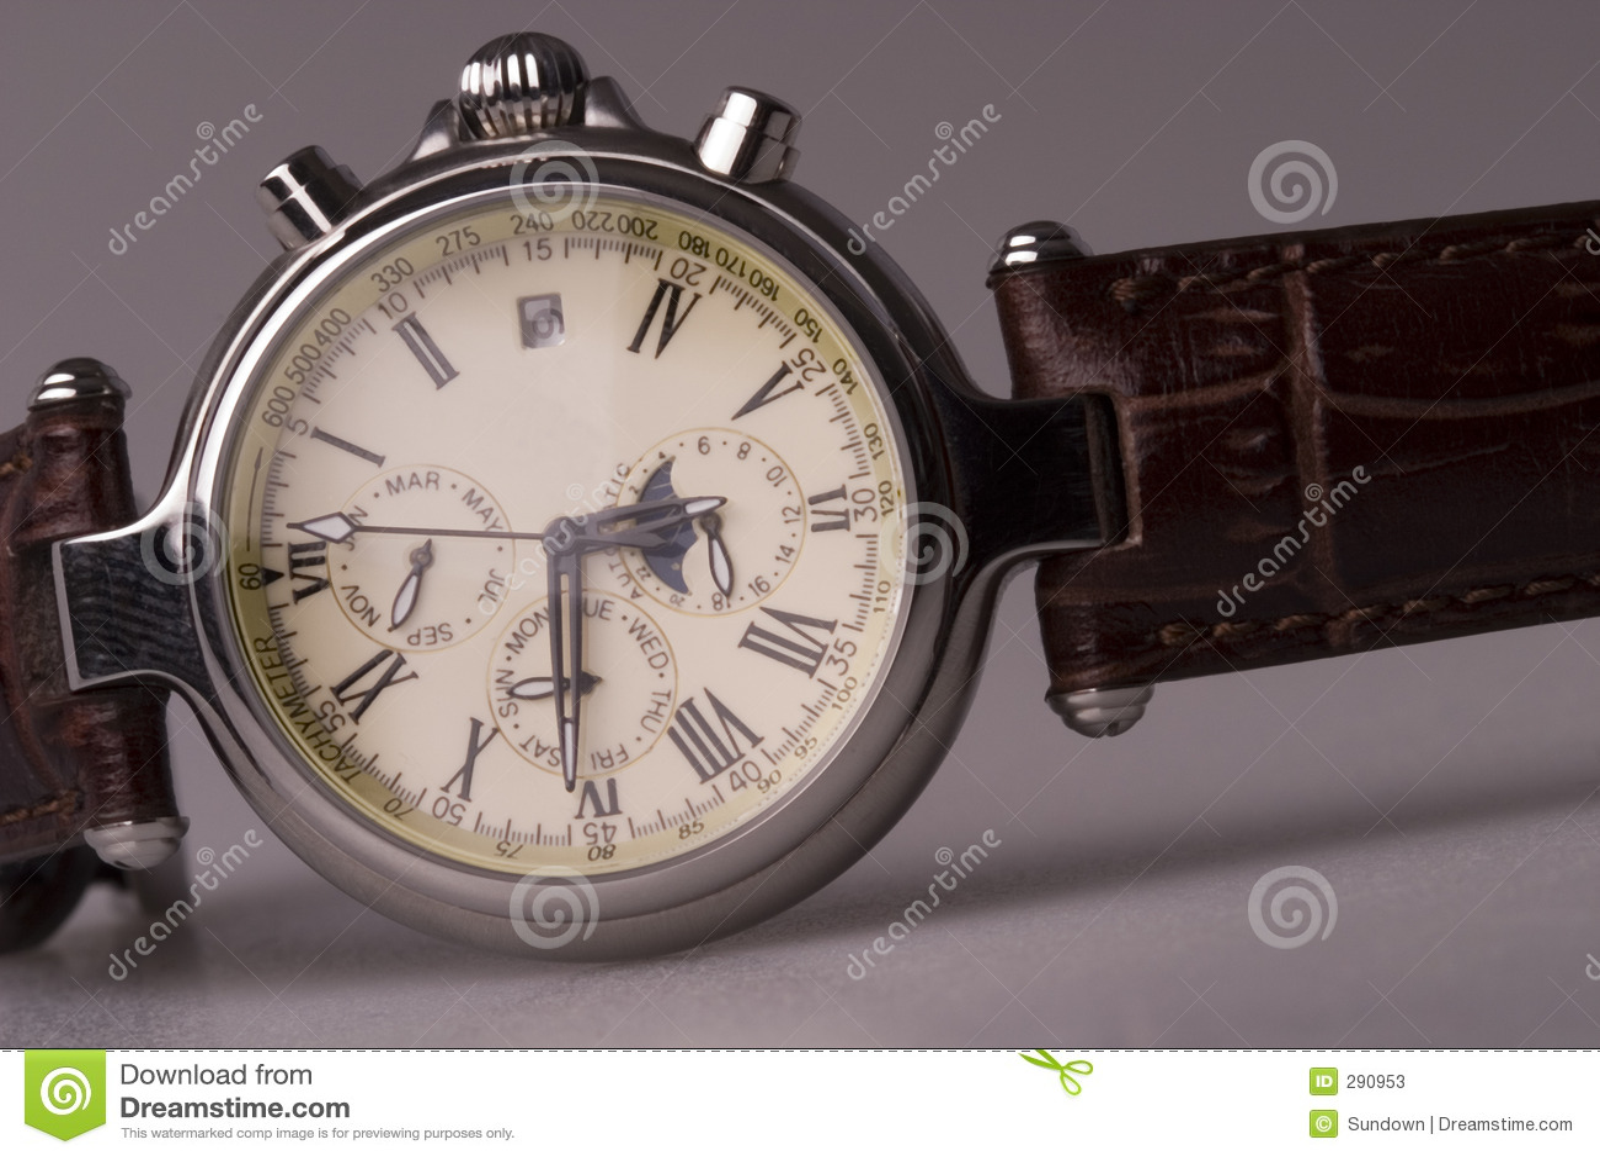 Chronograph 2